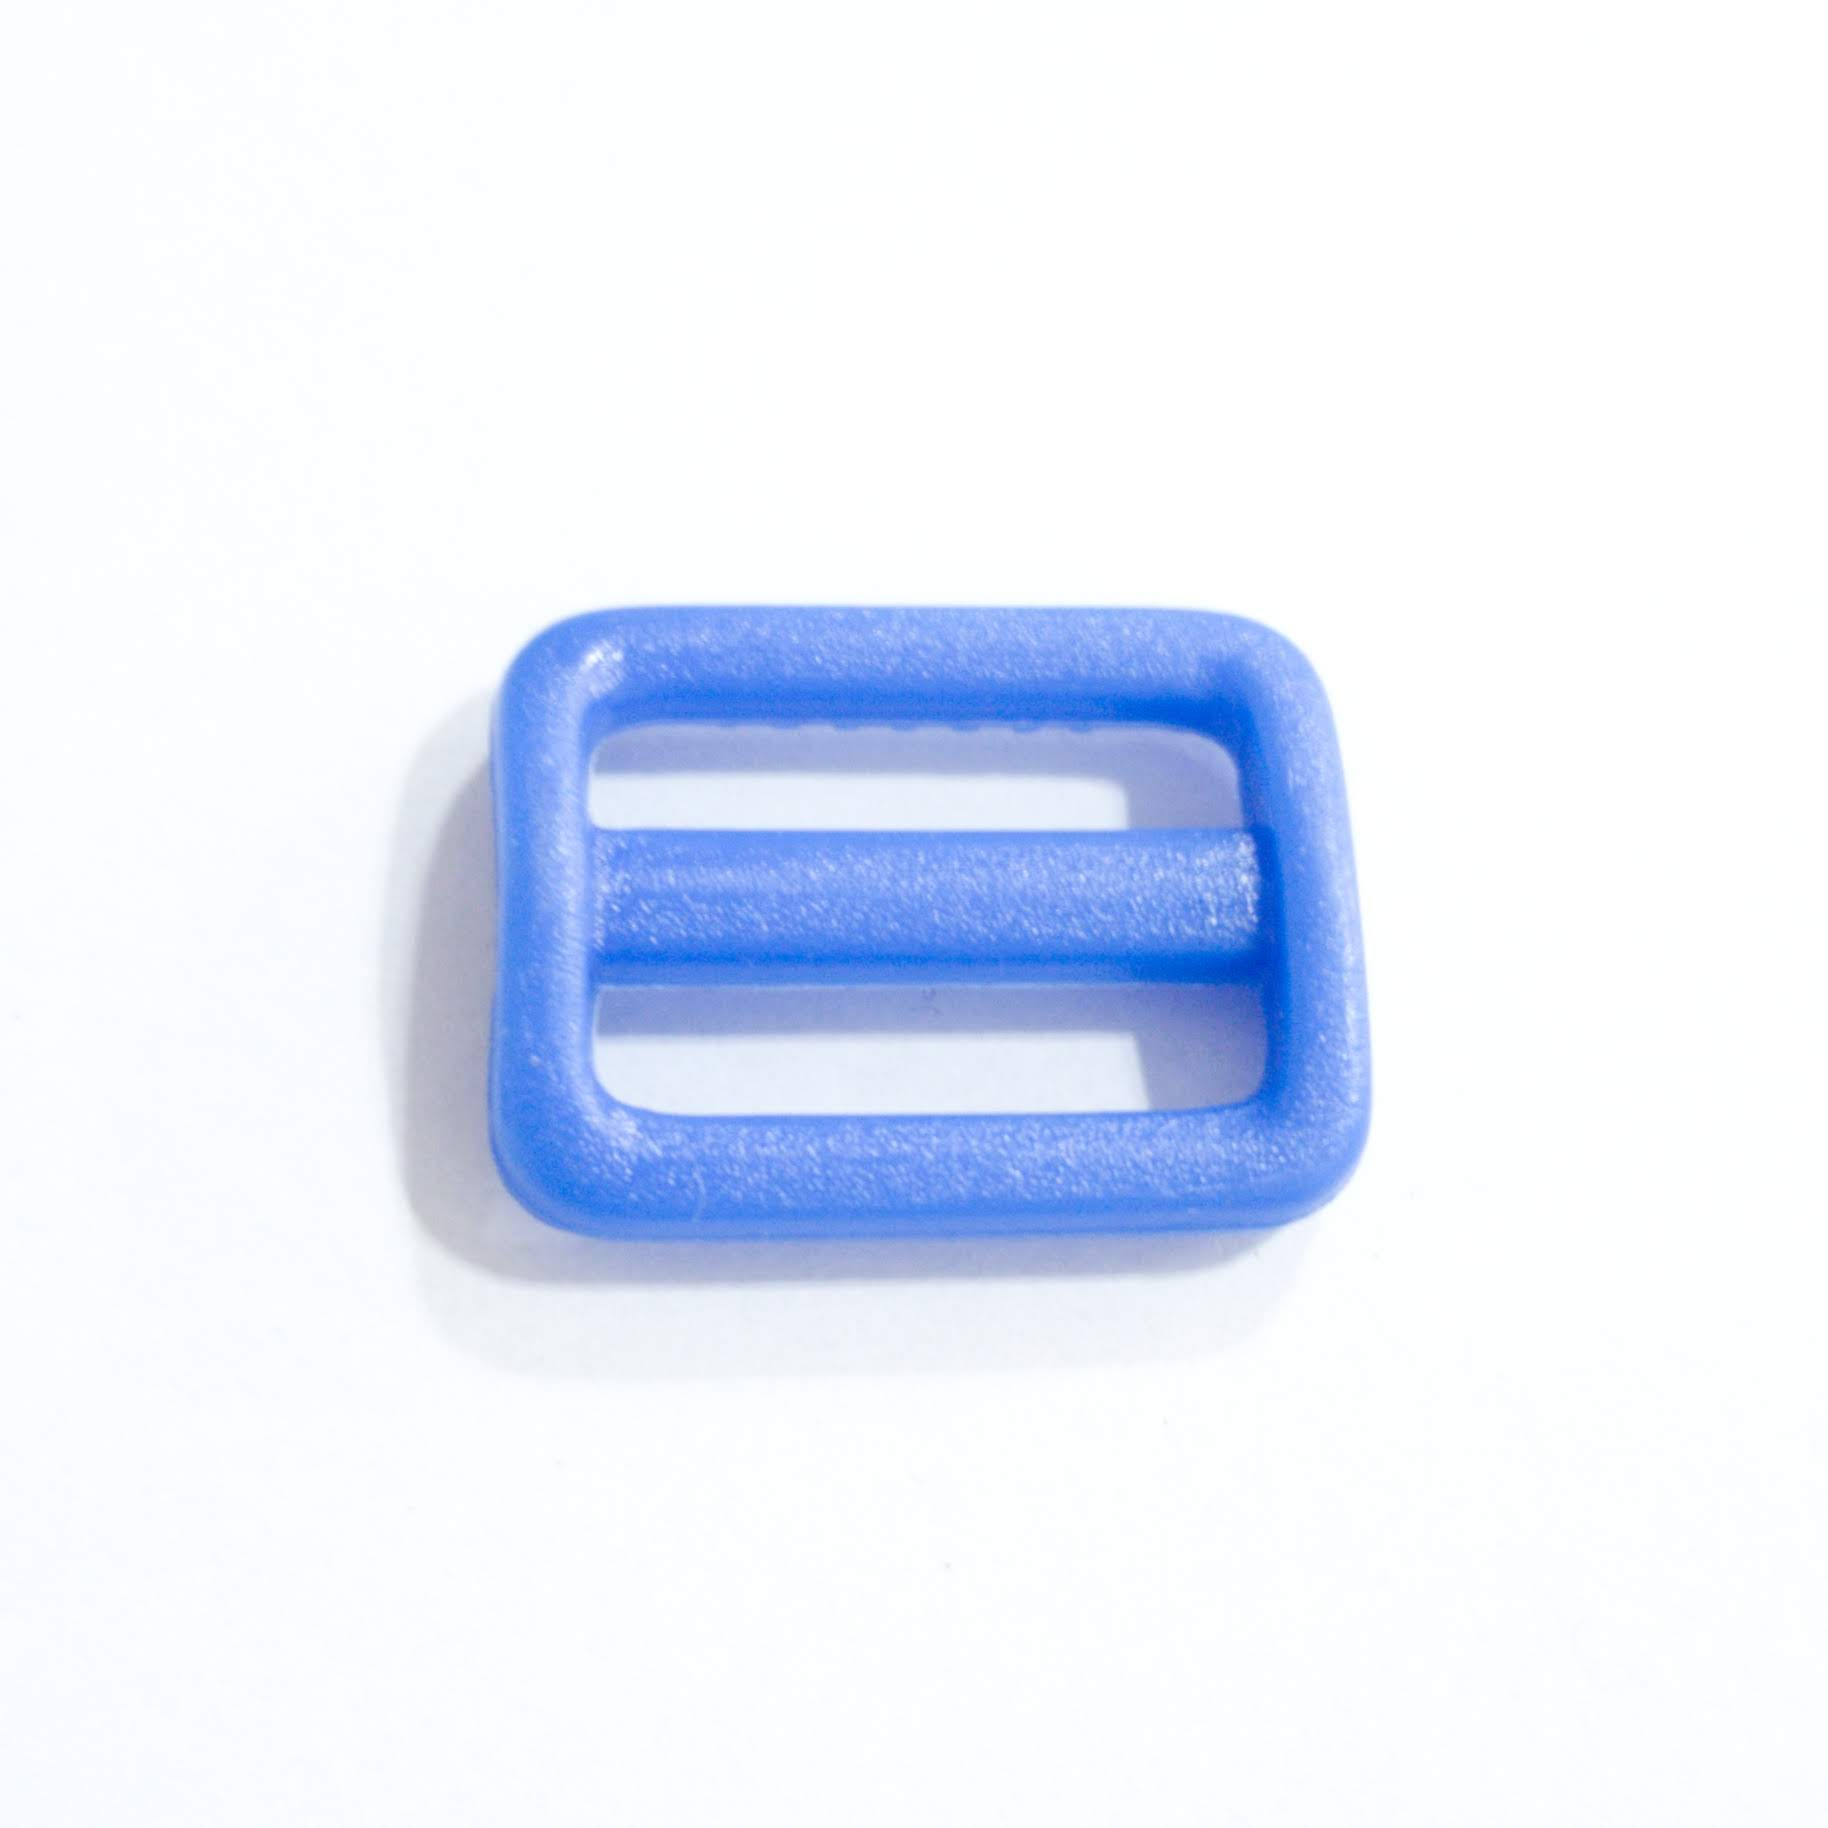 Regulador Plástico 20mm Azul Royal